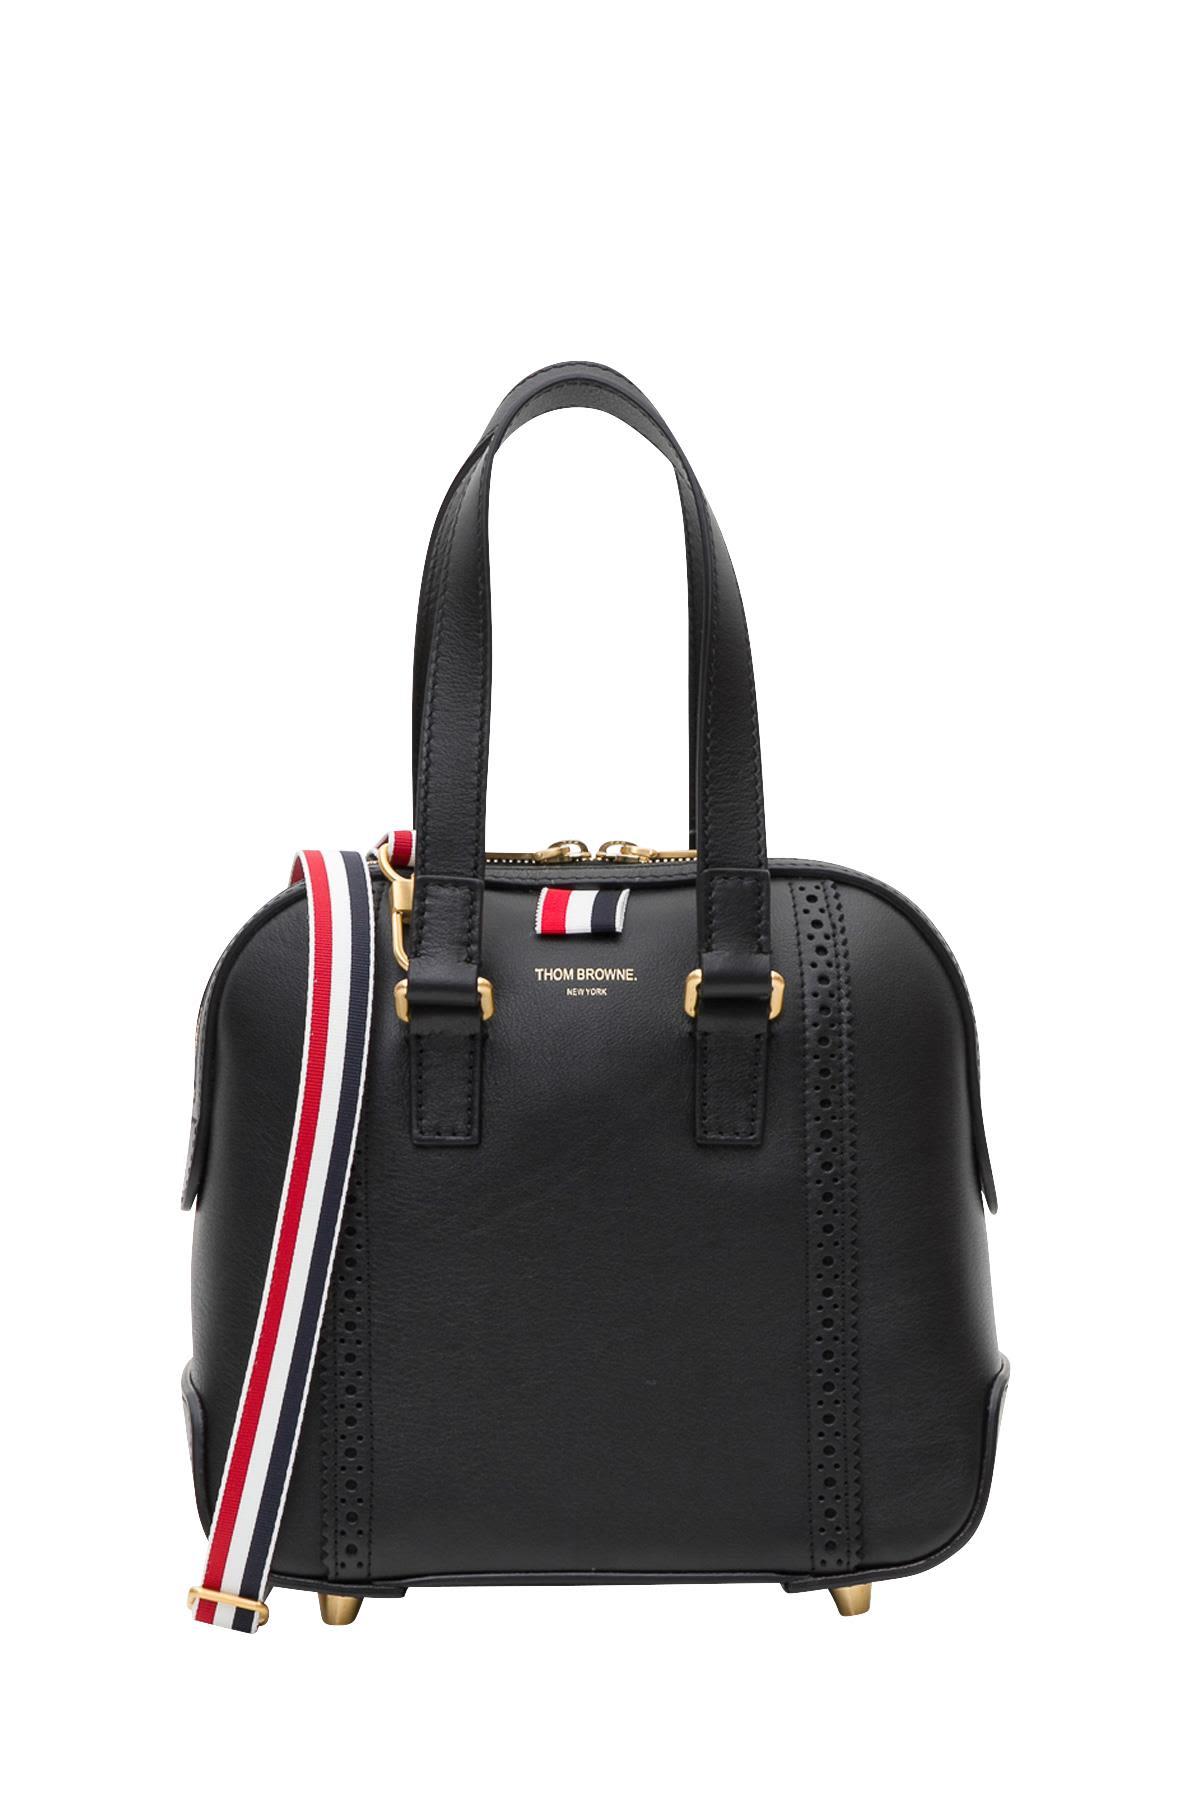 Thom Browne Mrs Thom Mini-Bag In Nero  0867c09e01902